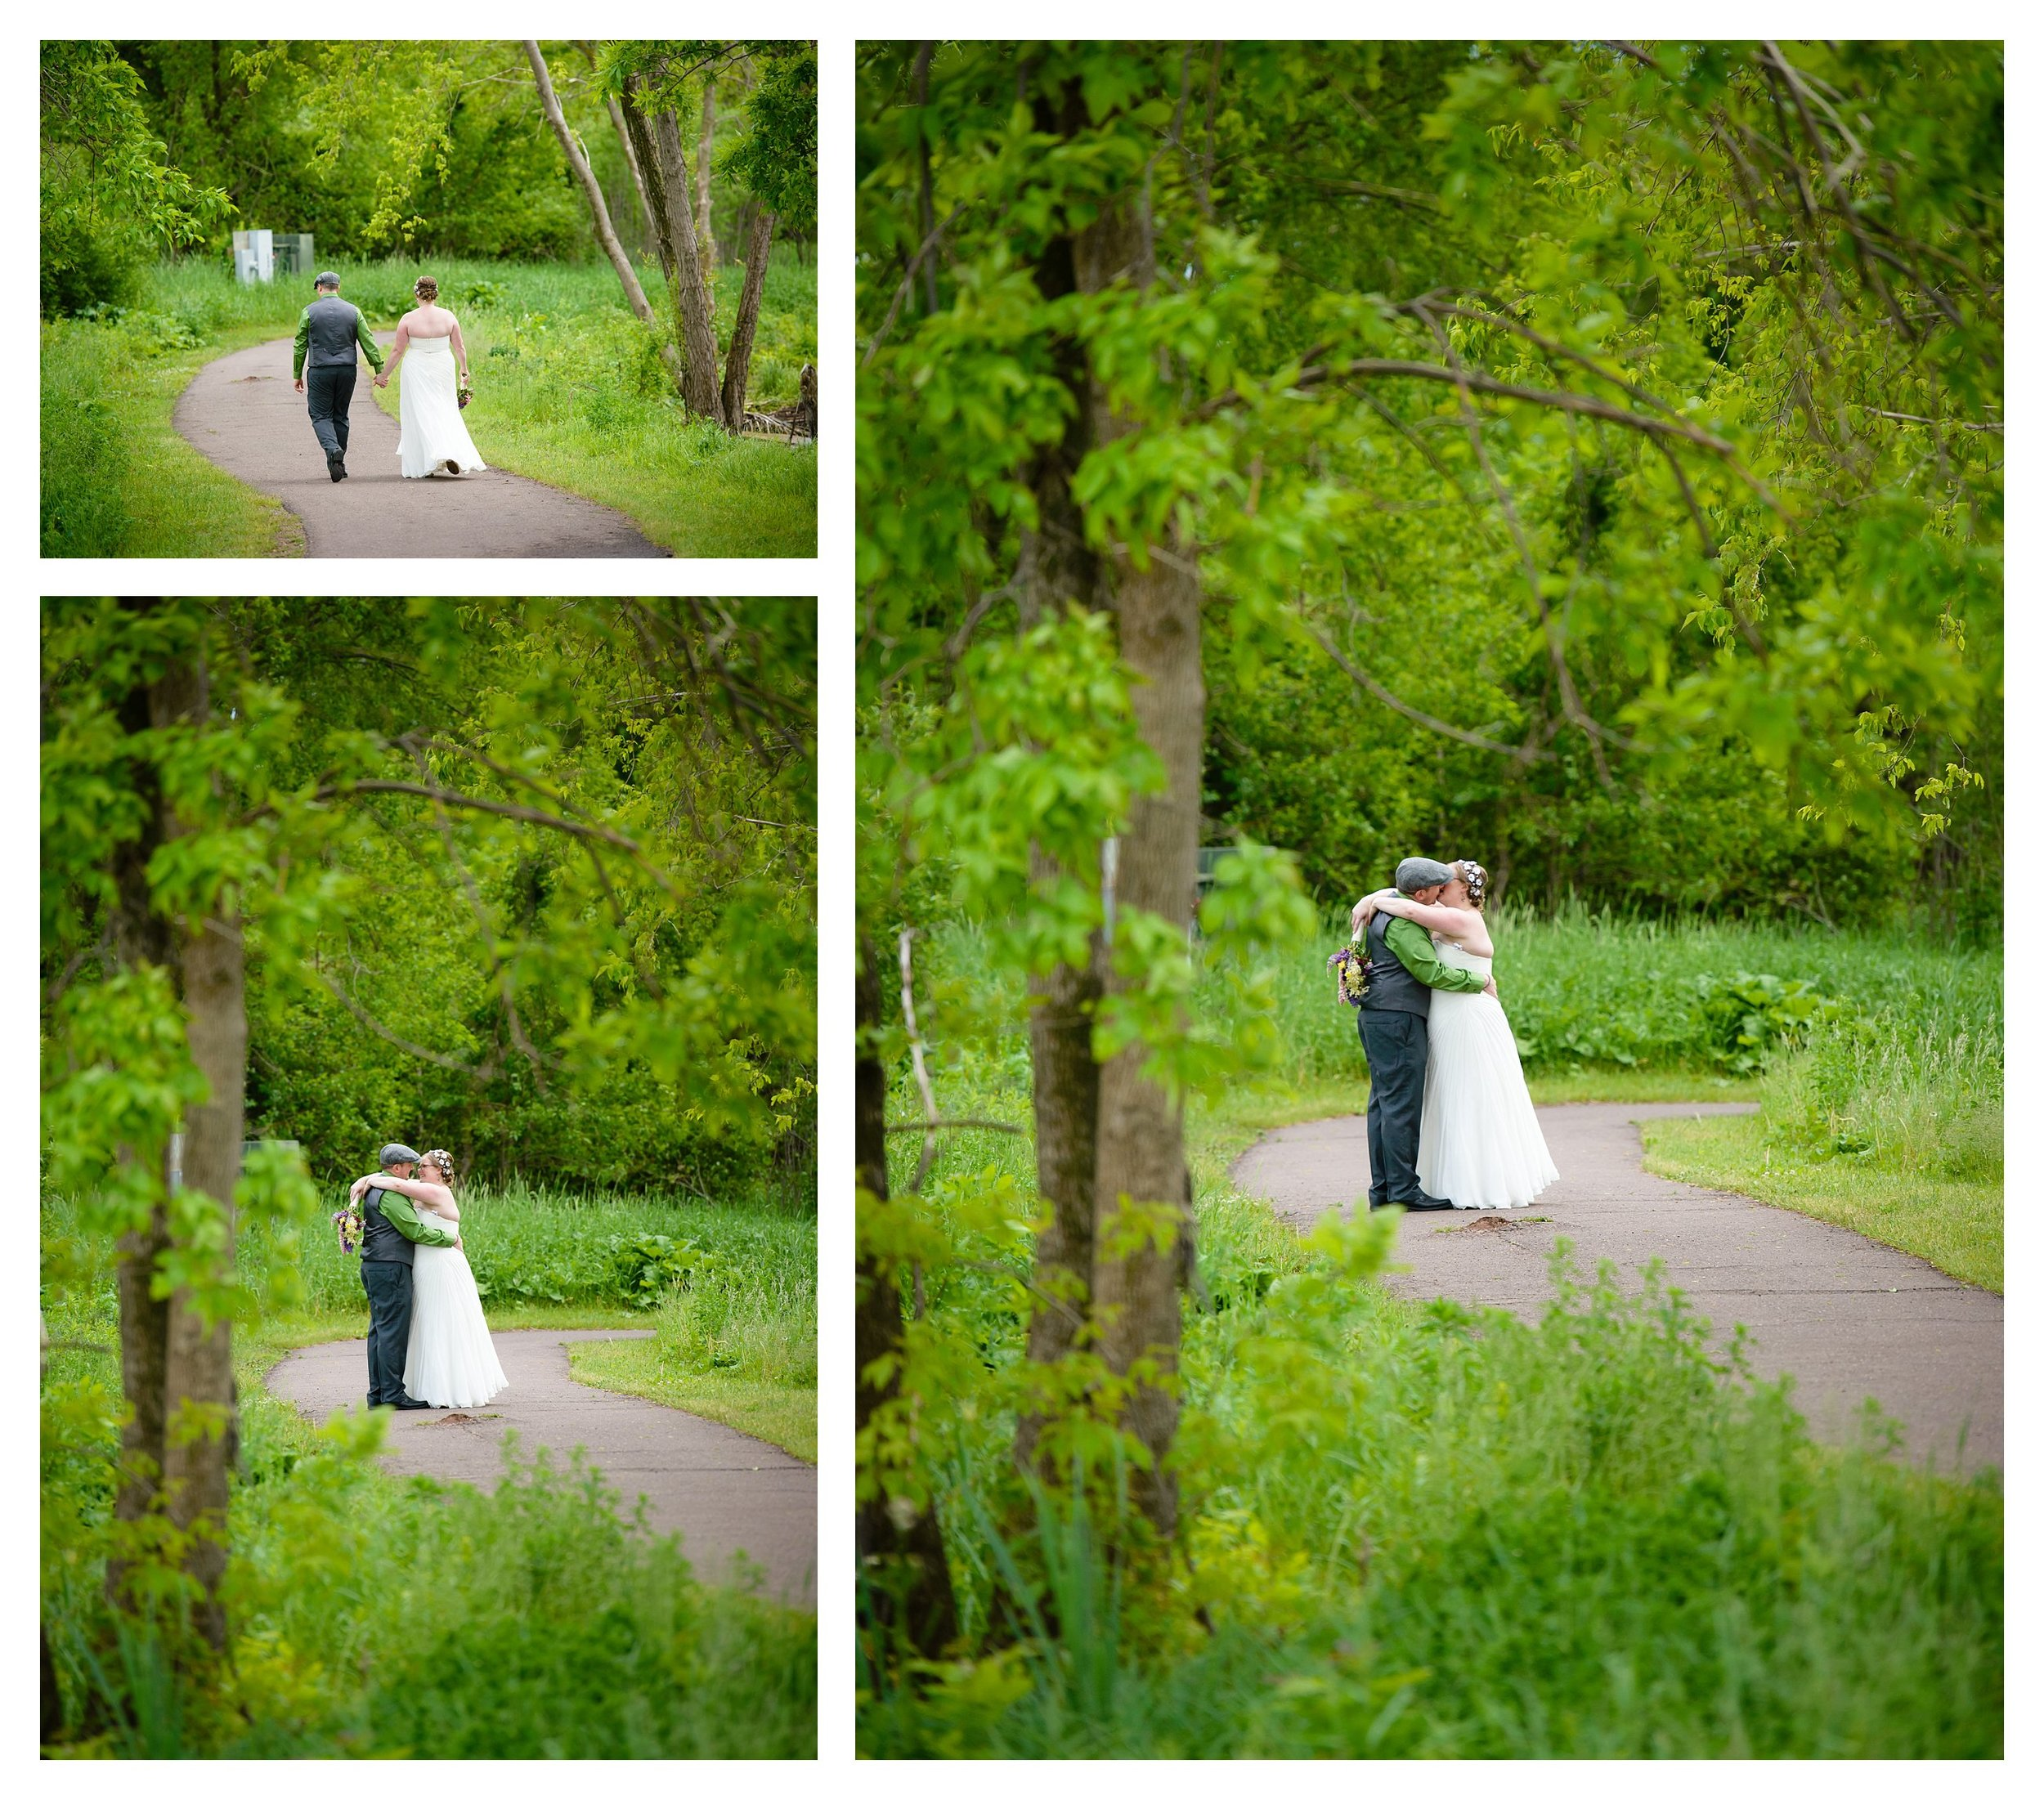 ashland oredock northwoods wisconsin wedding ps 139 photography_0295.jpg